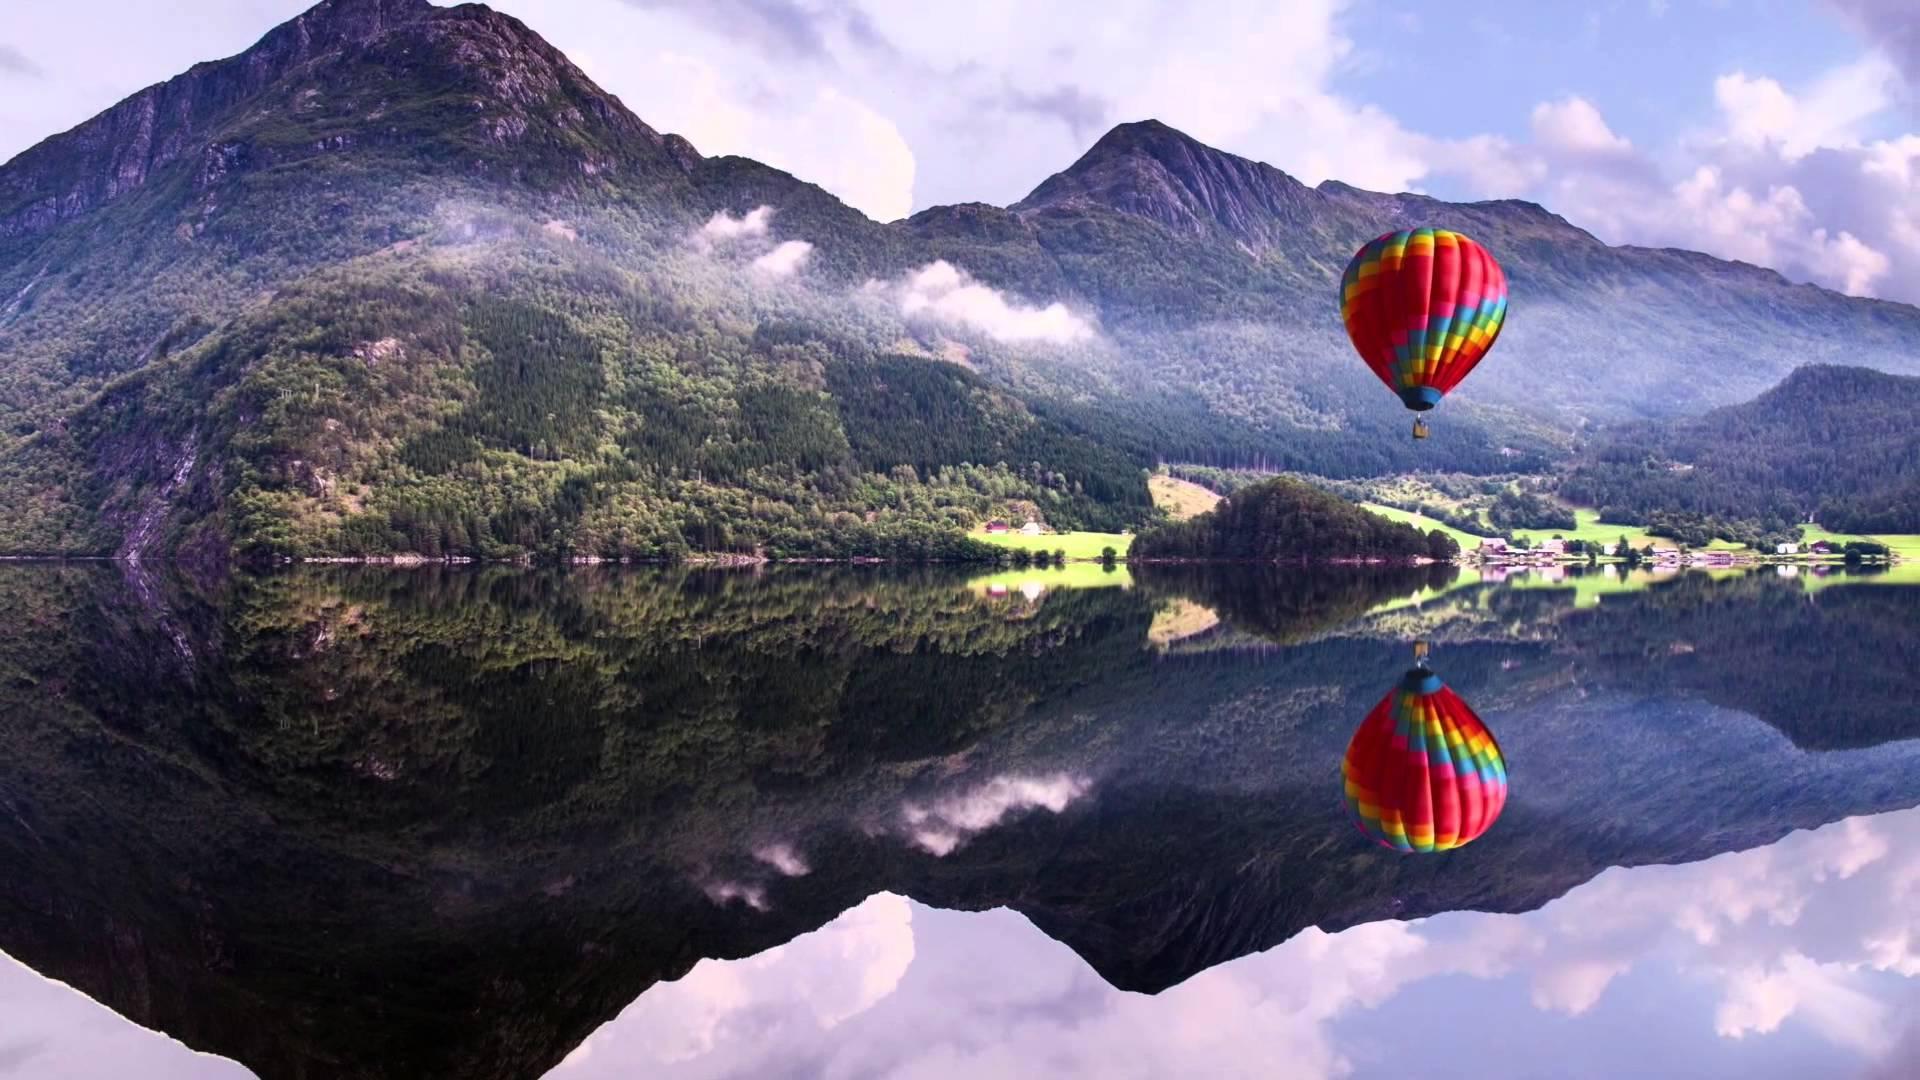 Winding River 4k Hd Desktop Wallpaper For 4k Ultra Hd Tv: 4K ULTRA HD Baloon, Lake, Mountains